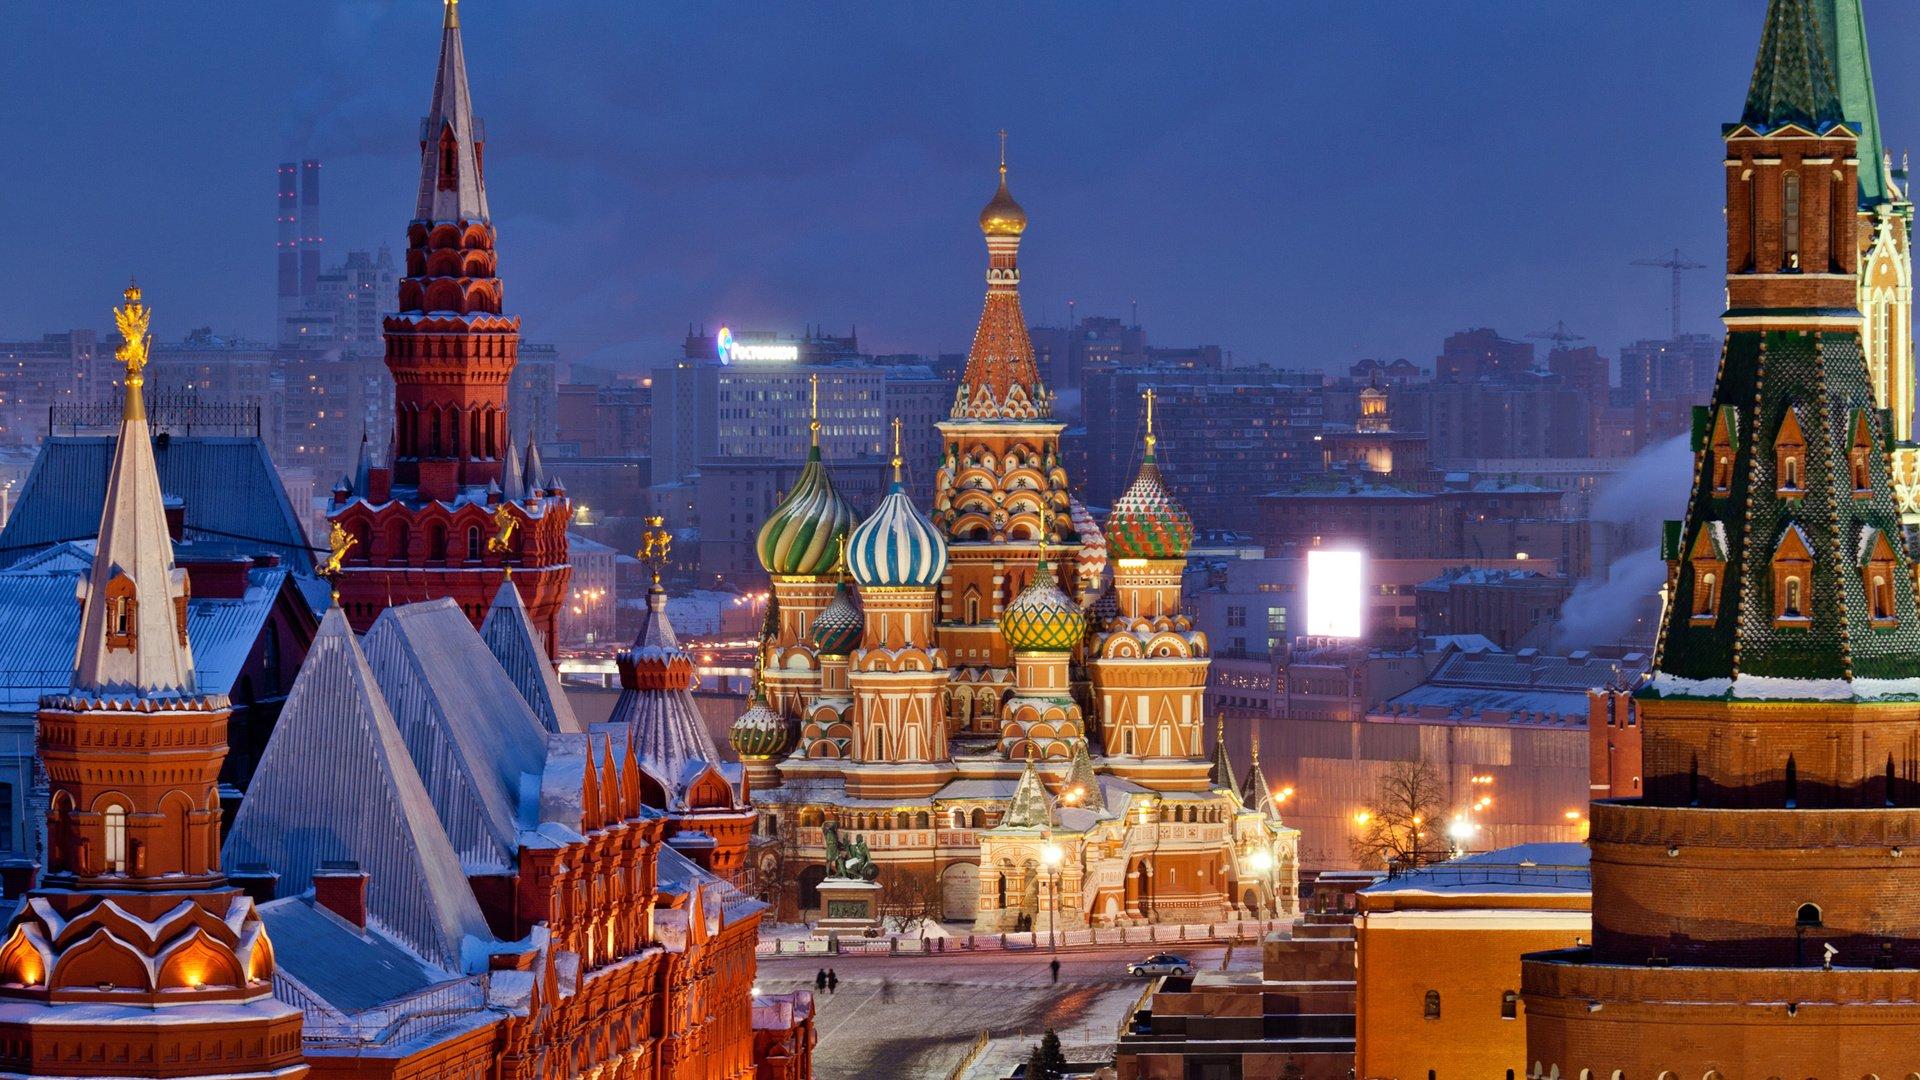 Русский мир без мягкой силы как машина без колес